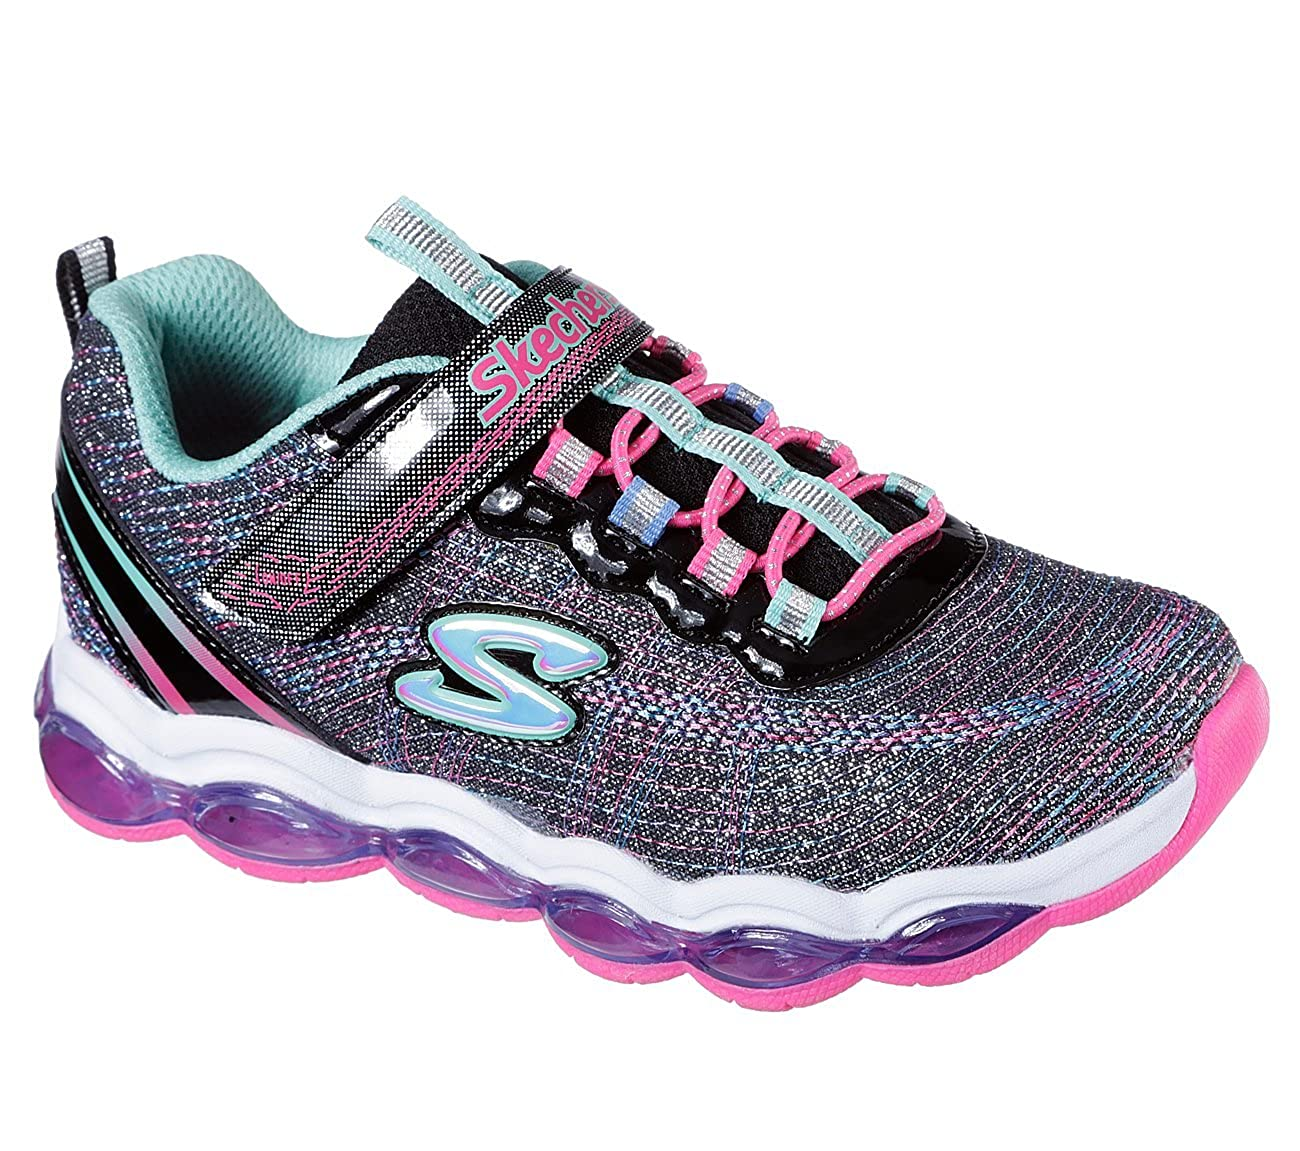 4.5 Black//Multi Glimmer Lites Sneakers Skechers 10833L Girls S Lights